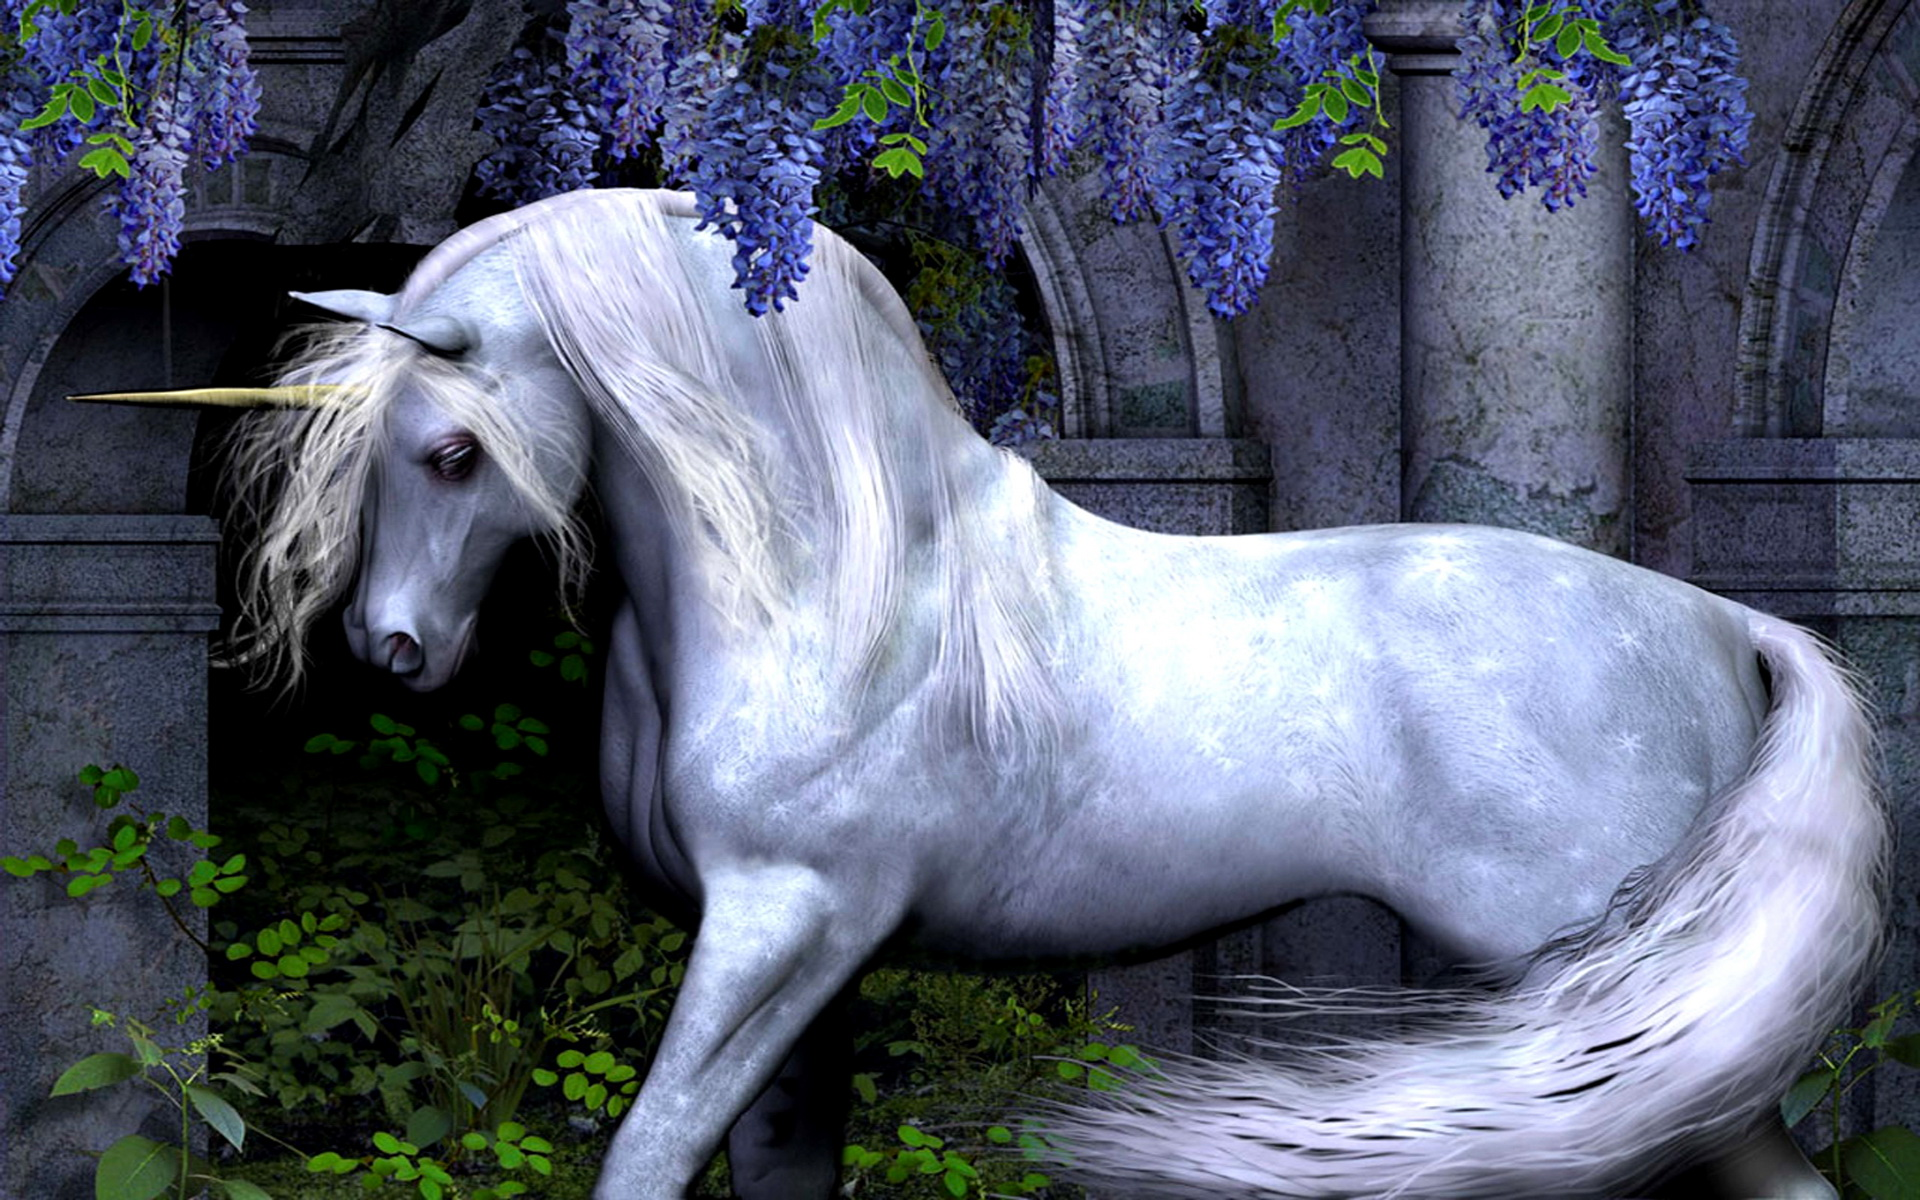 Unicorn   Wallpaper High Definition High Quality Widescreen 1920x1200